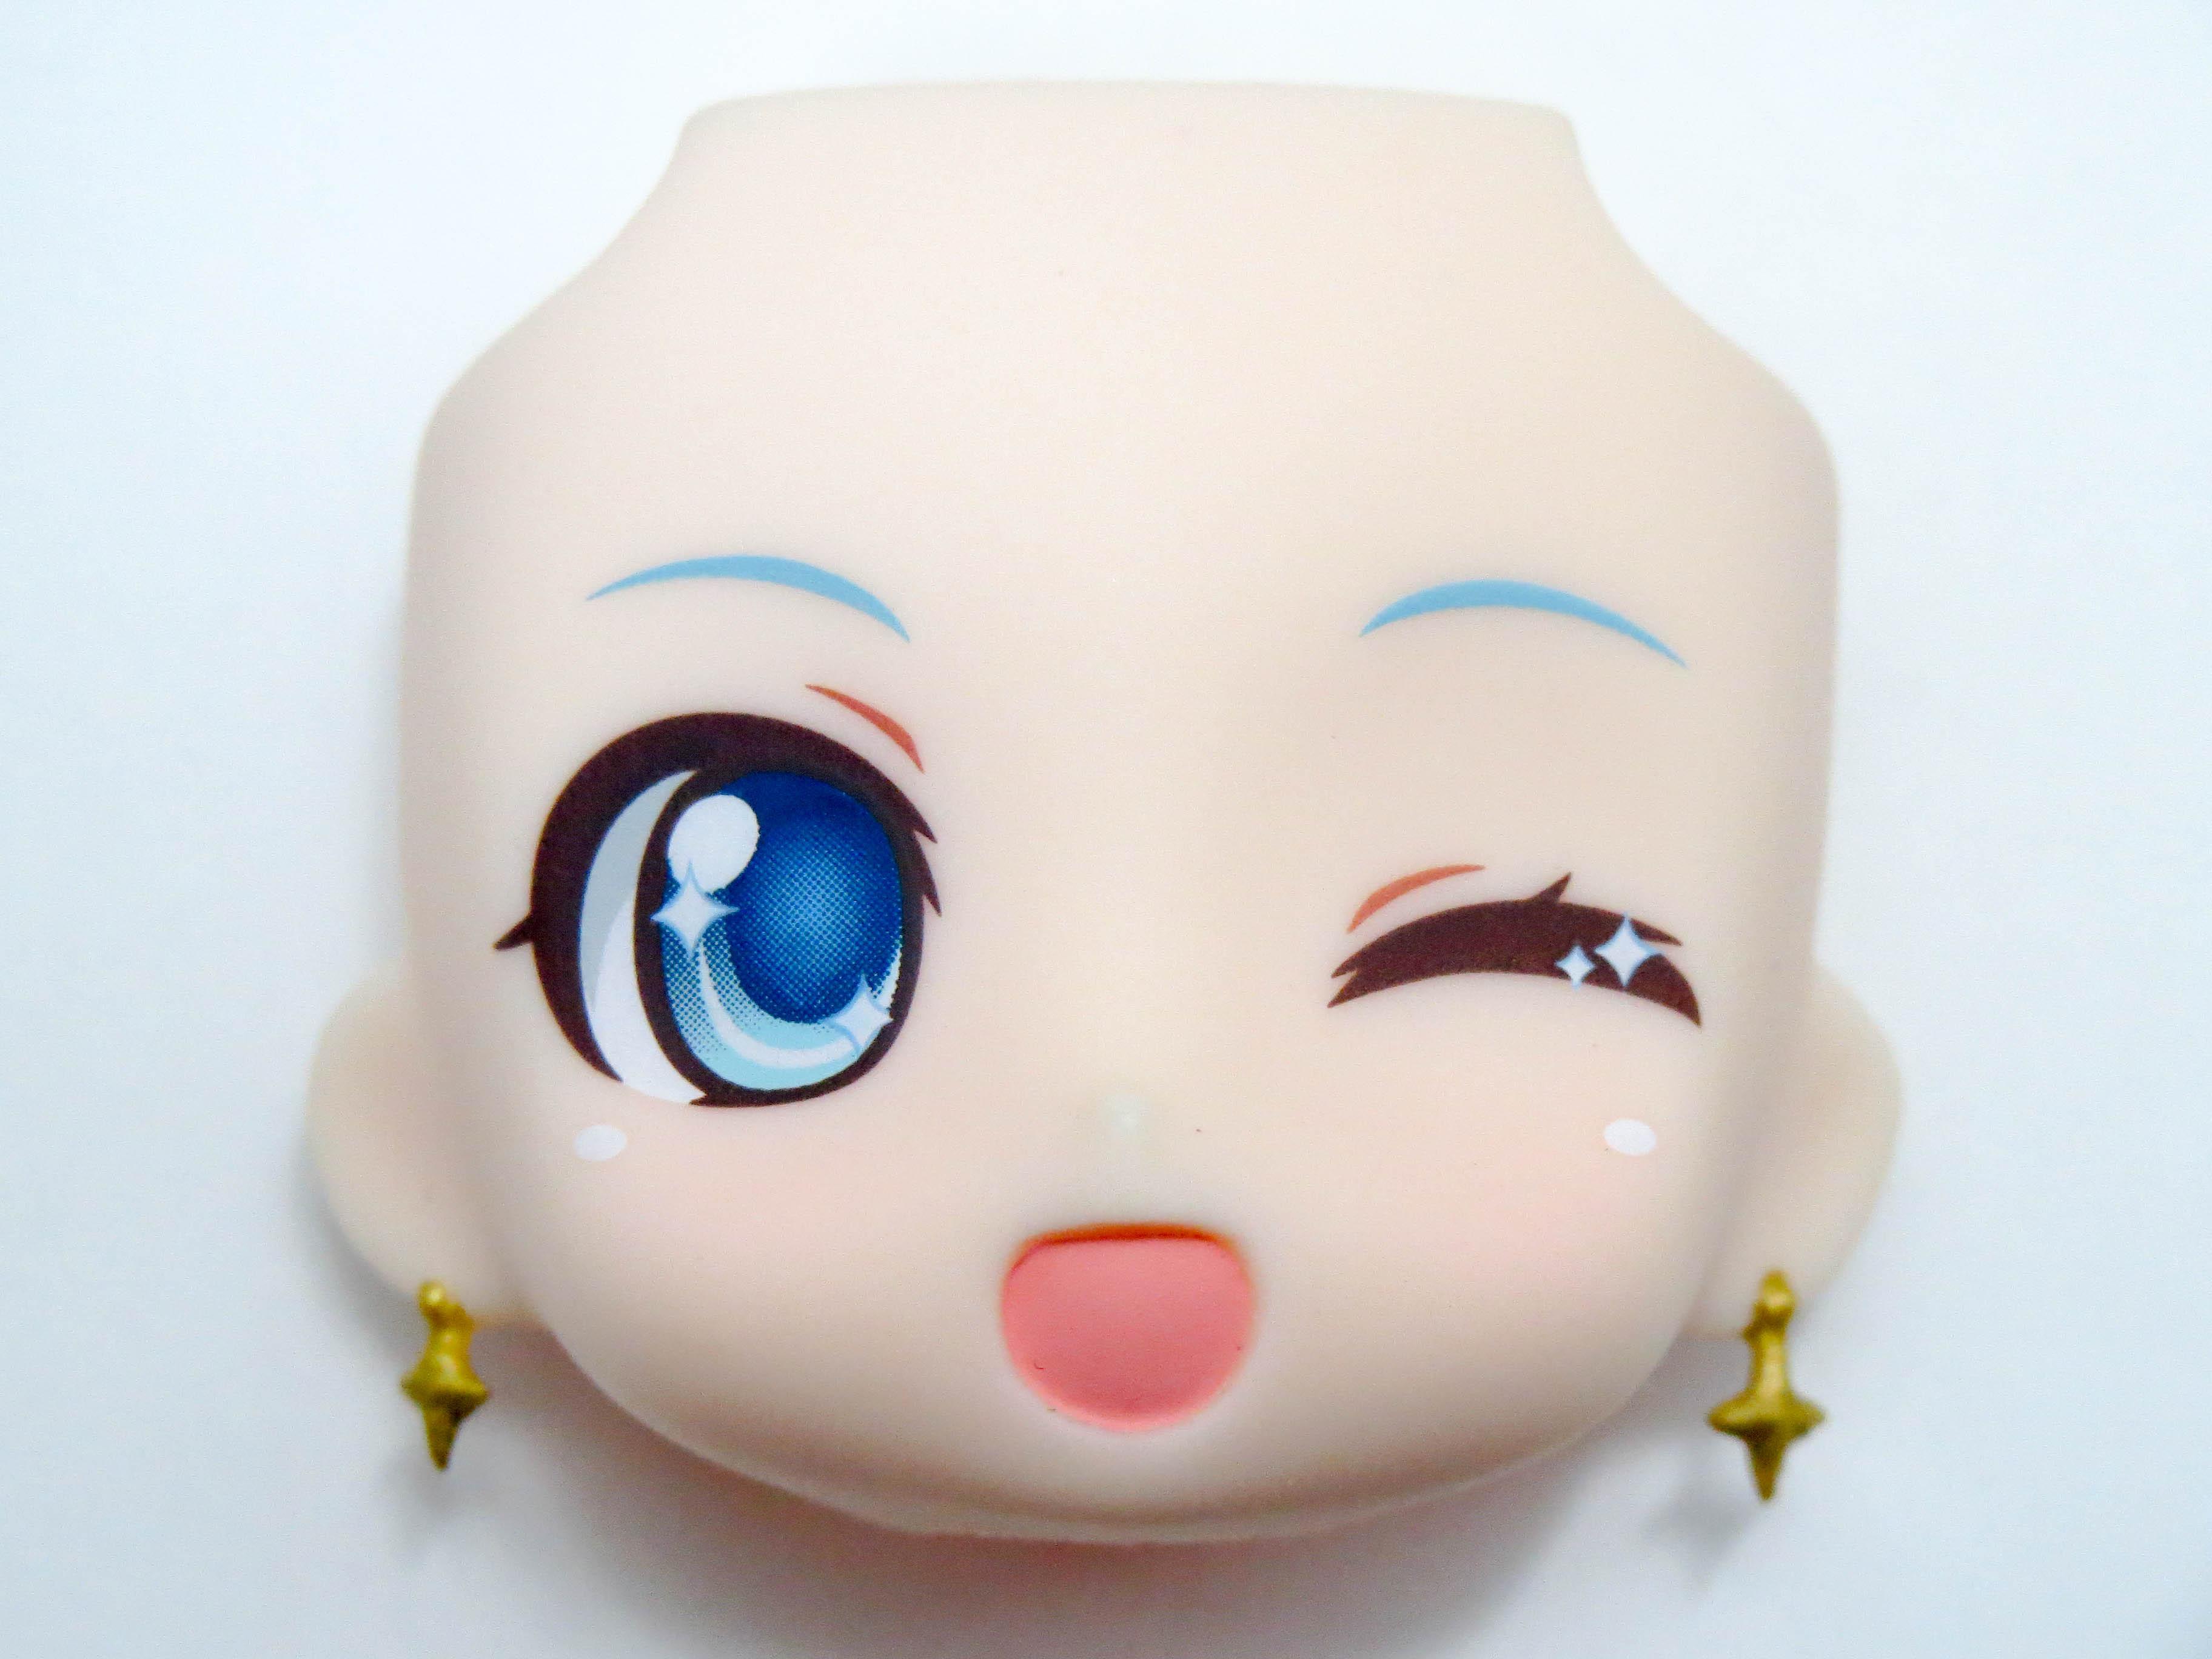 【SALE】【701】 雪ミク Twinkle Snow Ver. 顔パーツ ウインク顔 ねんどろいど